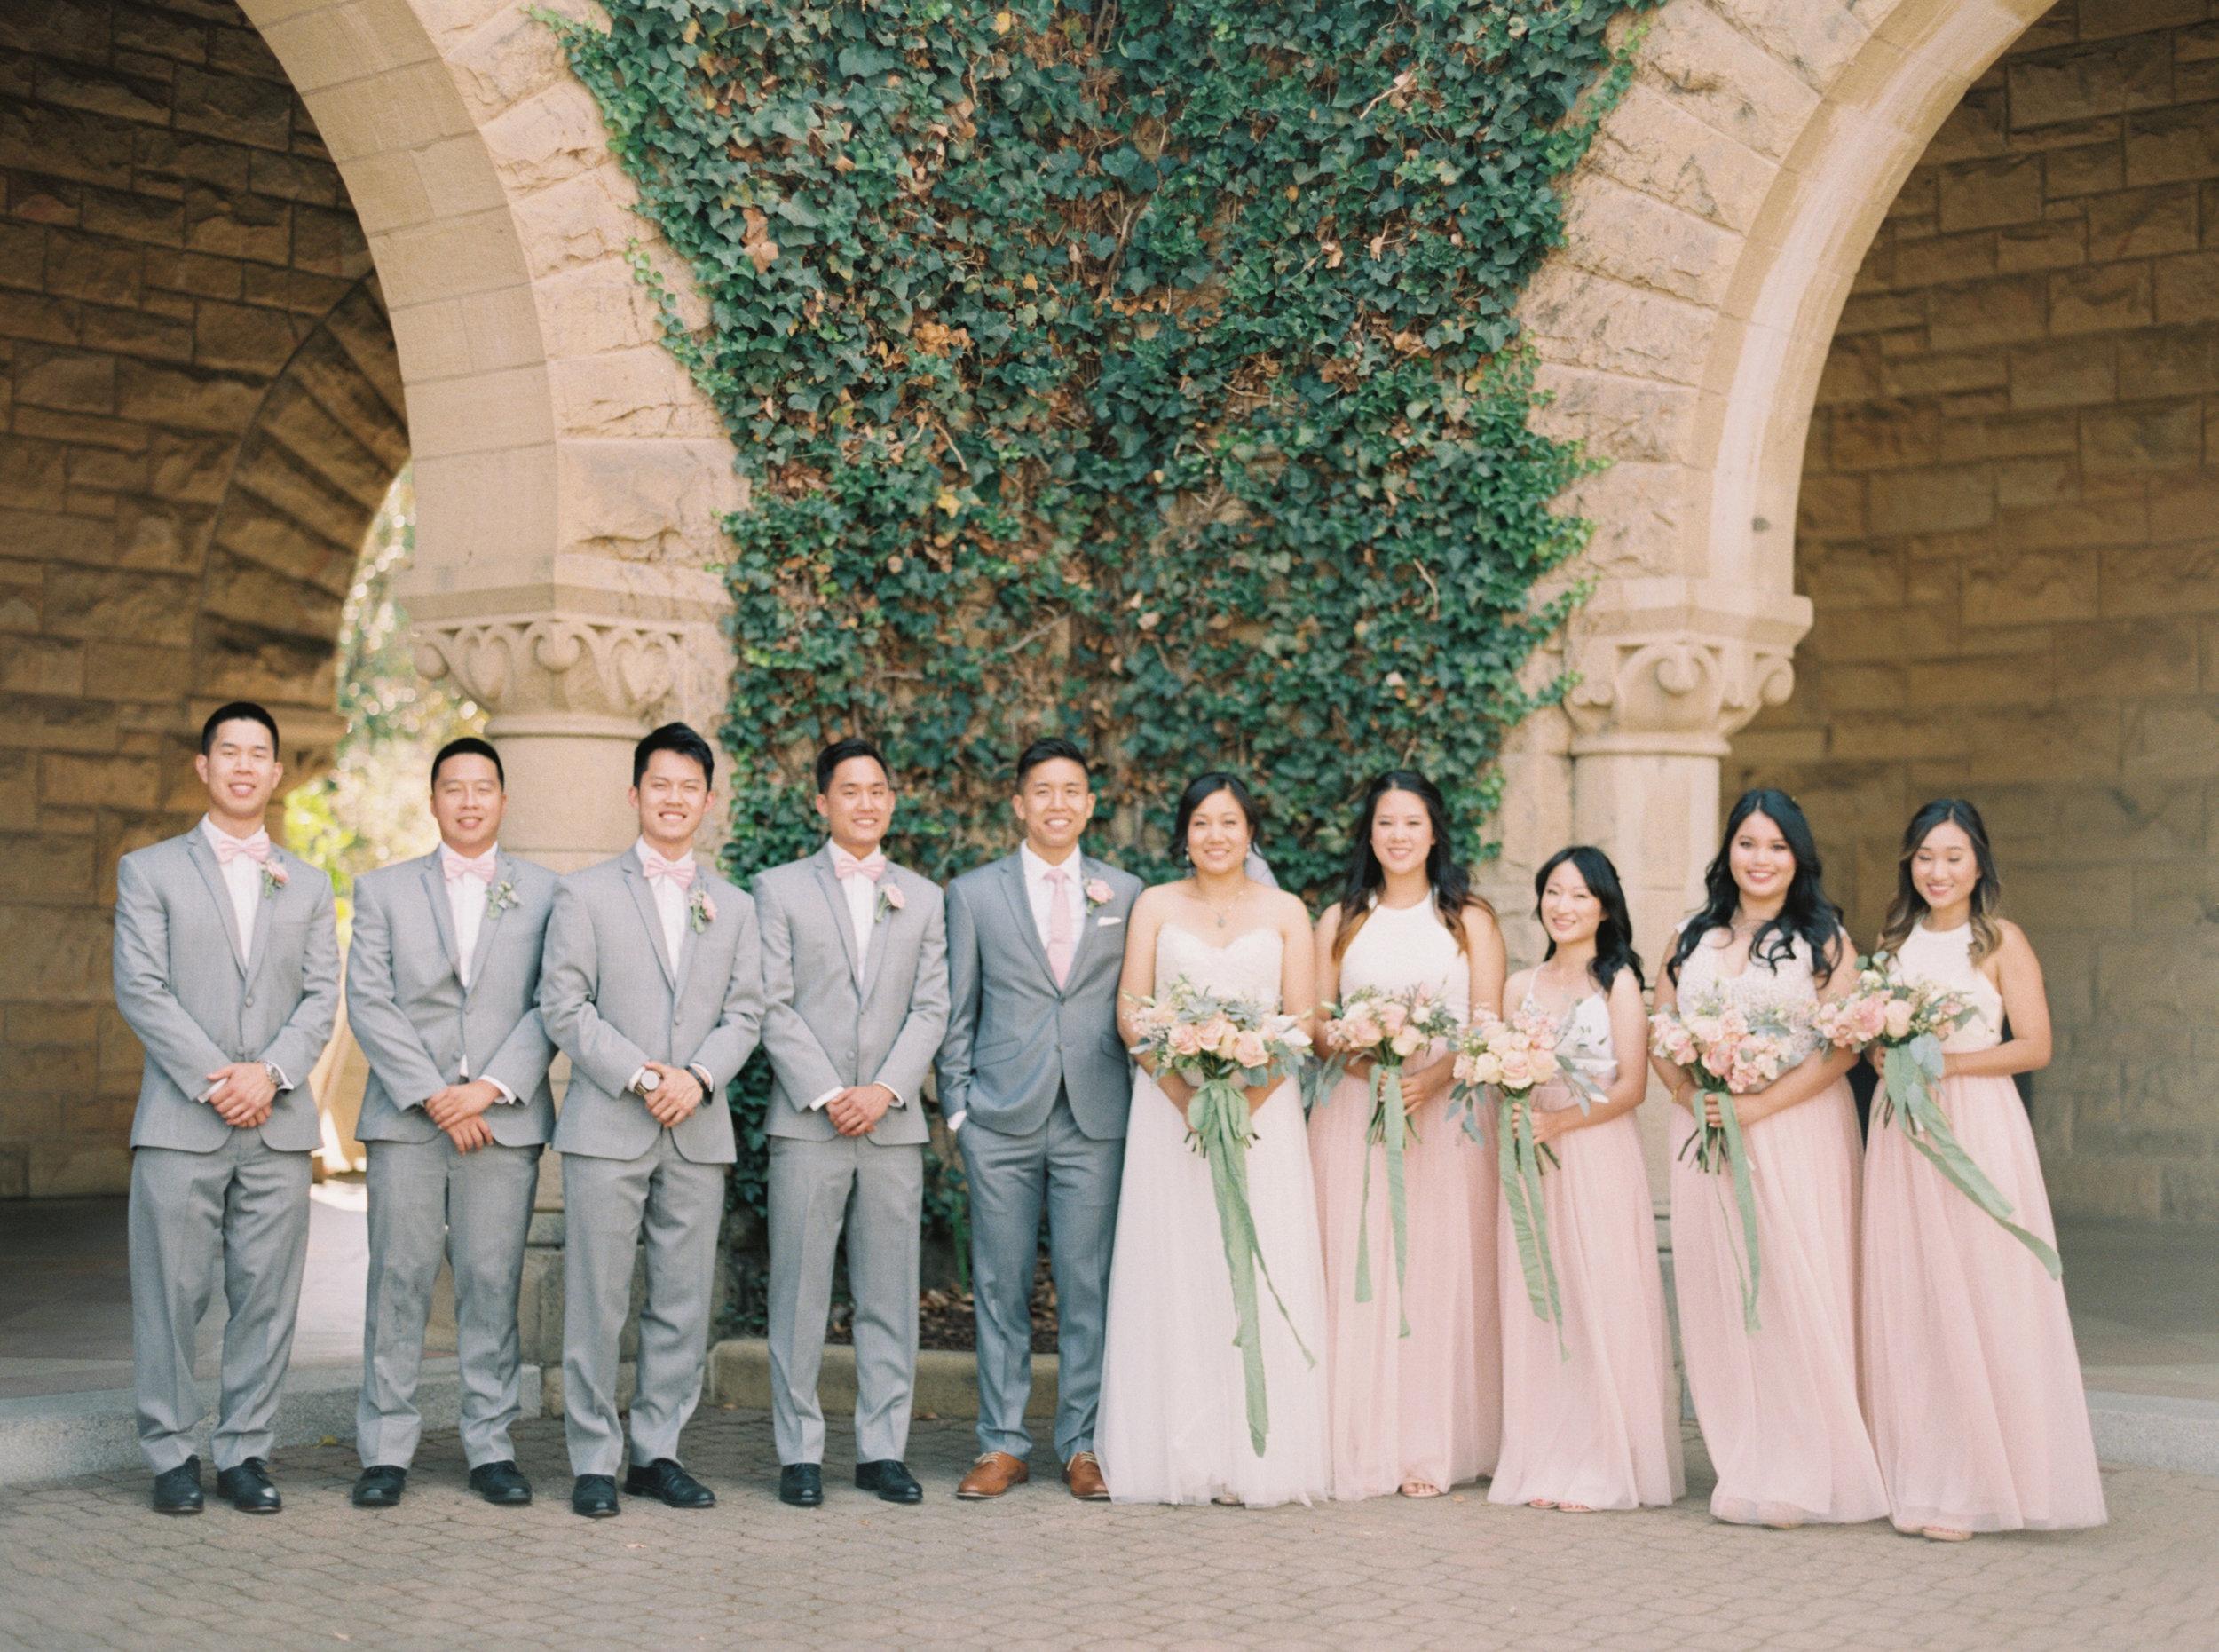 trynhphoto_wedding_photography_Standford_PaloAlto_SF_BayArea_Destination_OC_HA-122.jpg